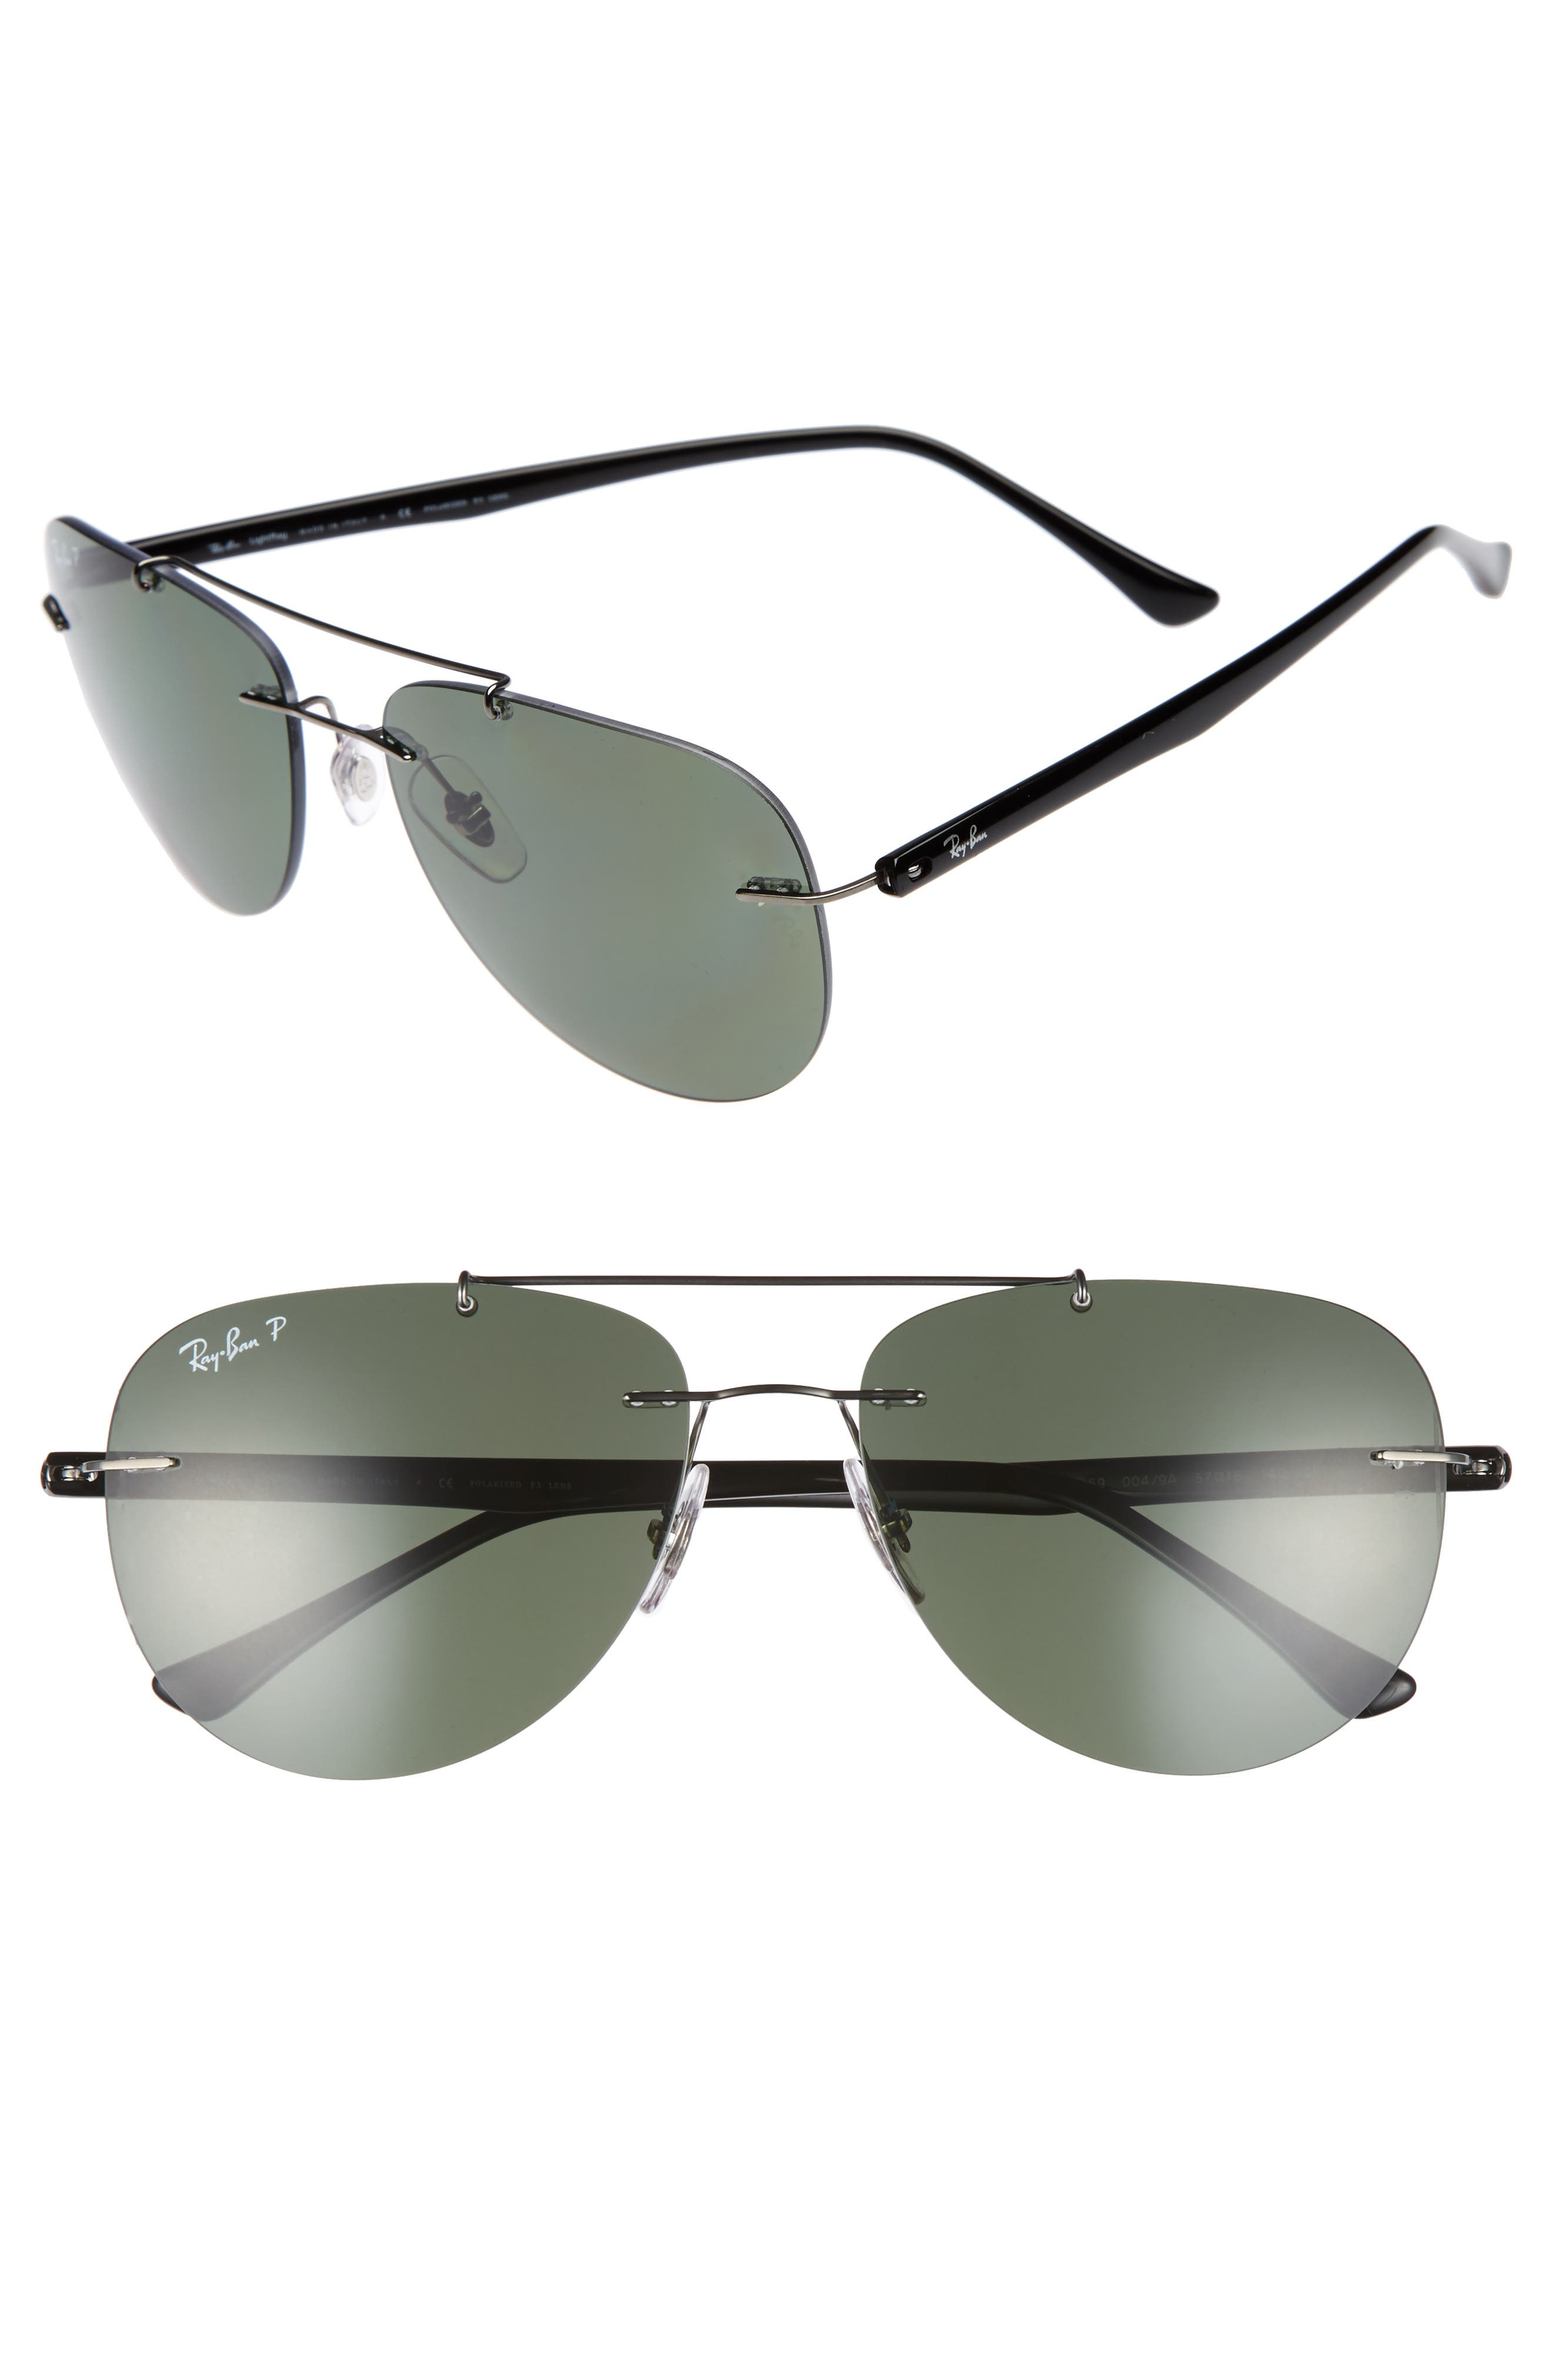 Phantos 57mm Polarized Rimless Aviator Sunglasses,                             Main thumbnail 1, color,                             Polar Gunmetal